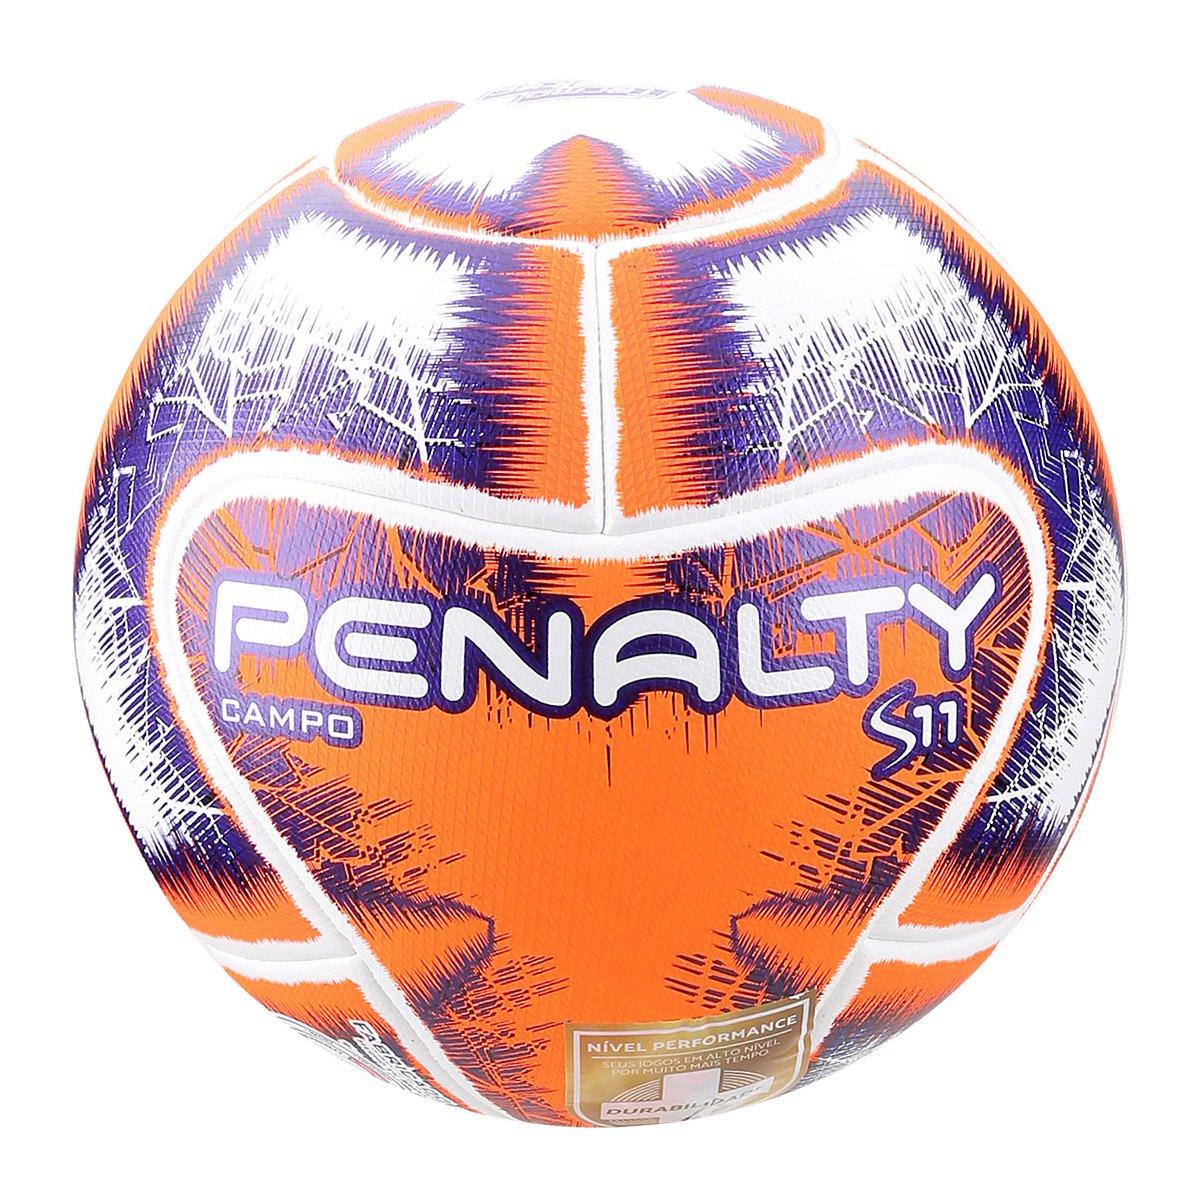 d7aa0f45ab Bola de Futebol Campo Penalty S11 R2 Ix